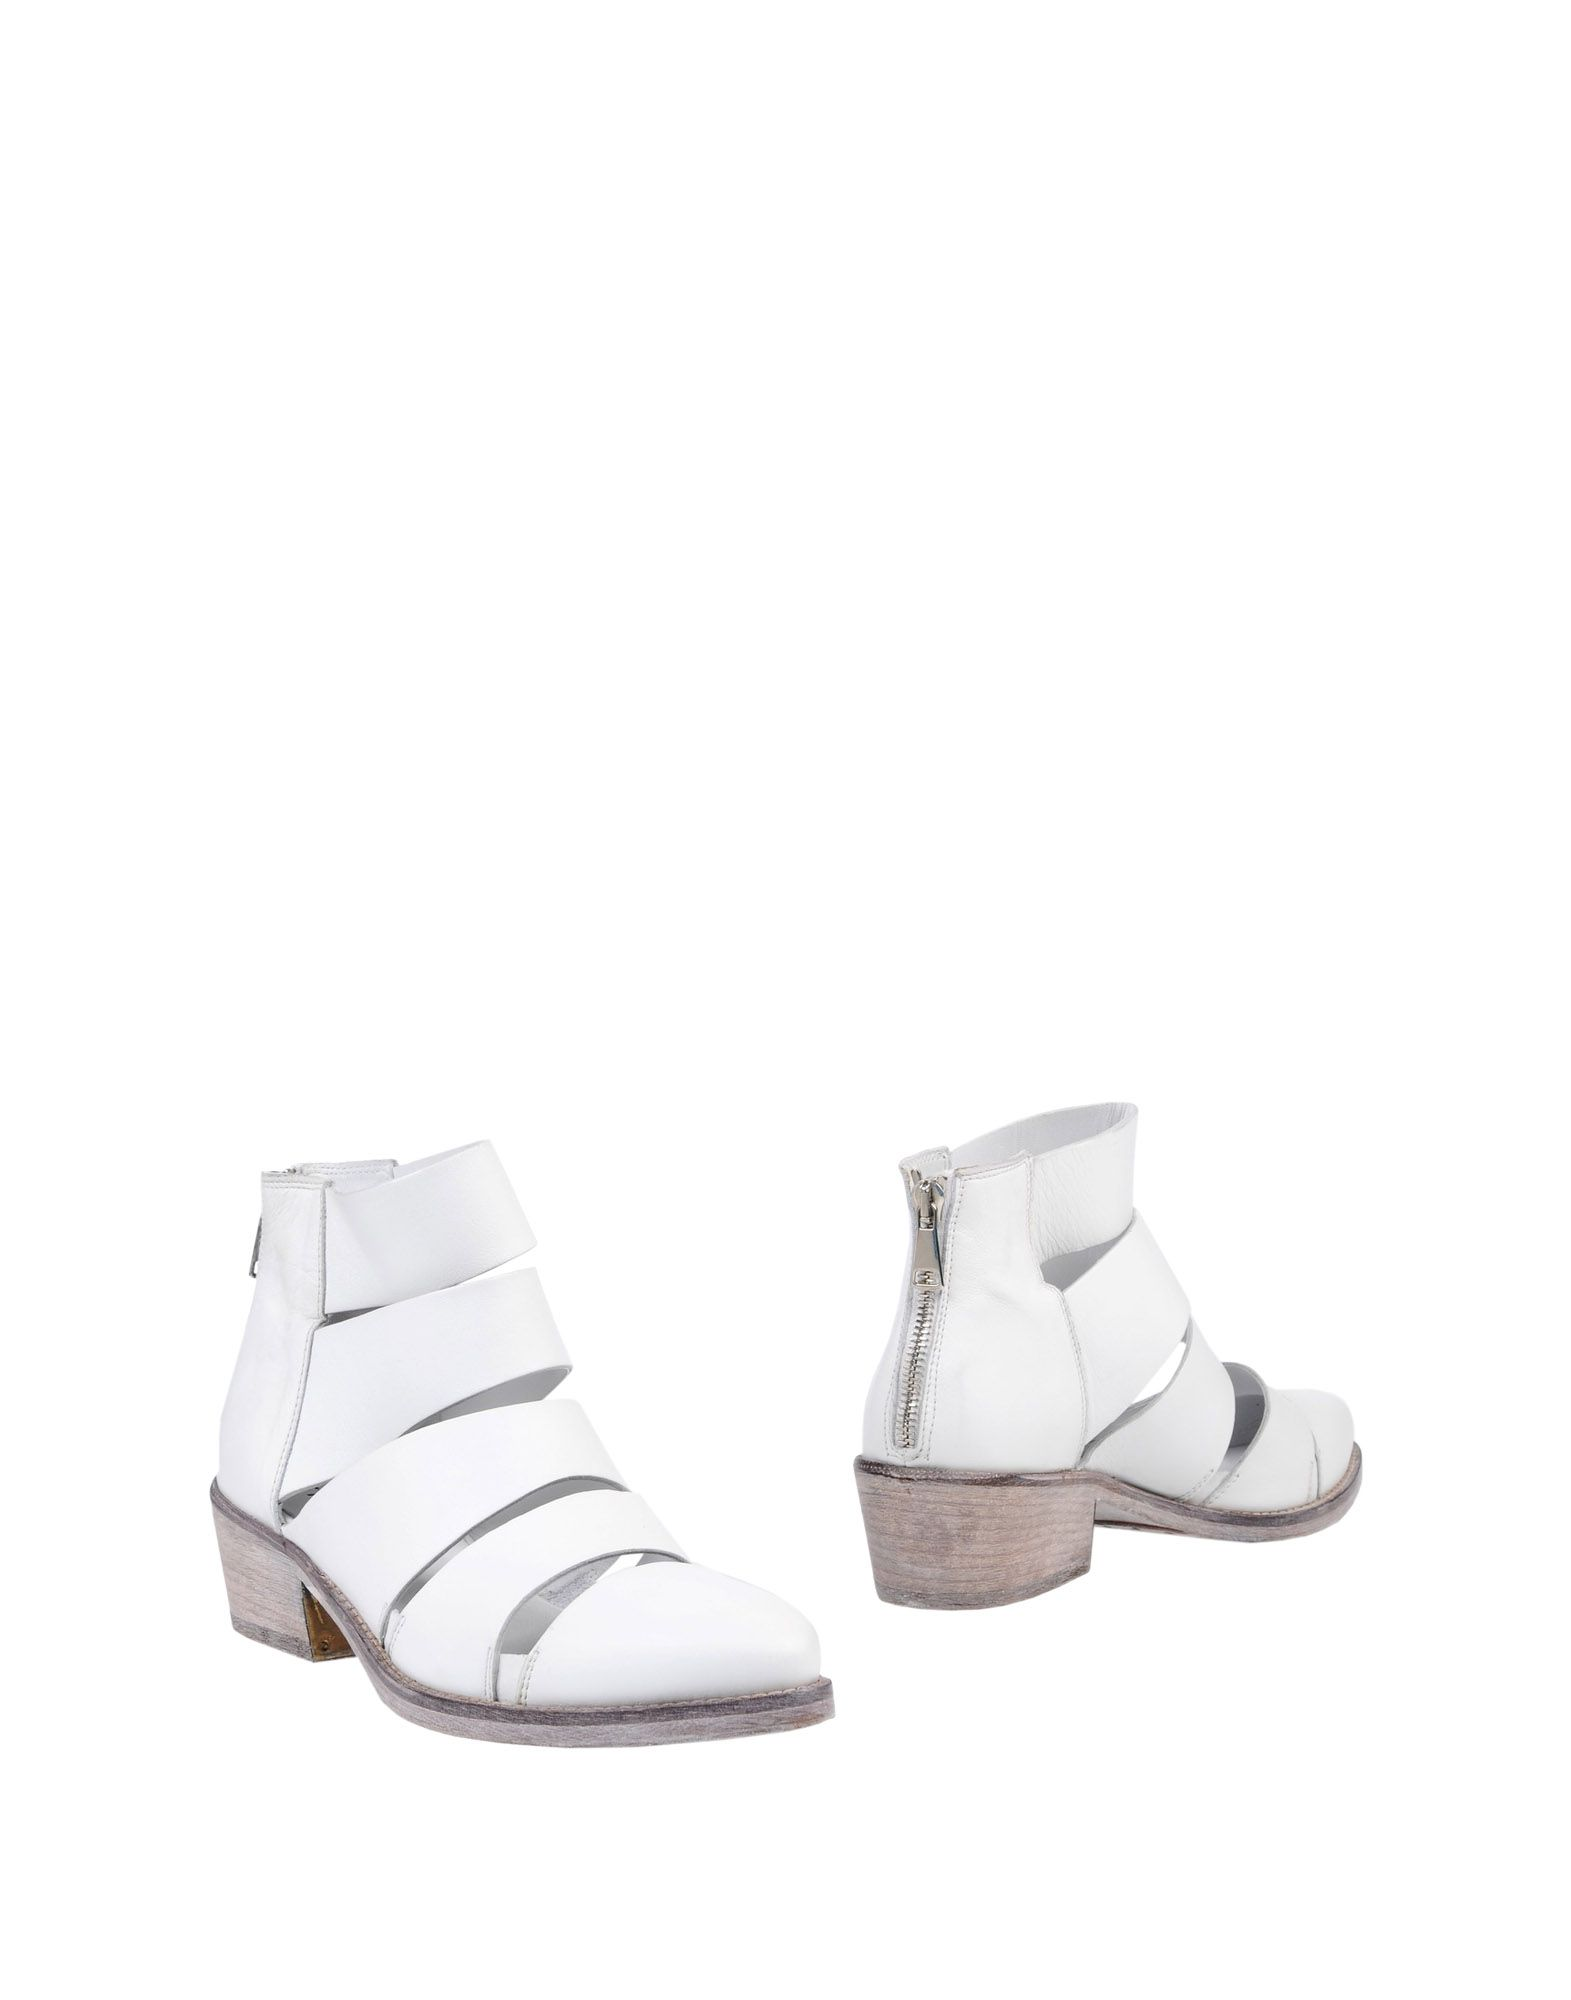 Strategia Strategia Ankle Boot - Women Strategia Strategia Ankle Boots online on  United Kingdom - 11412225VA e519be